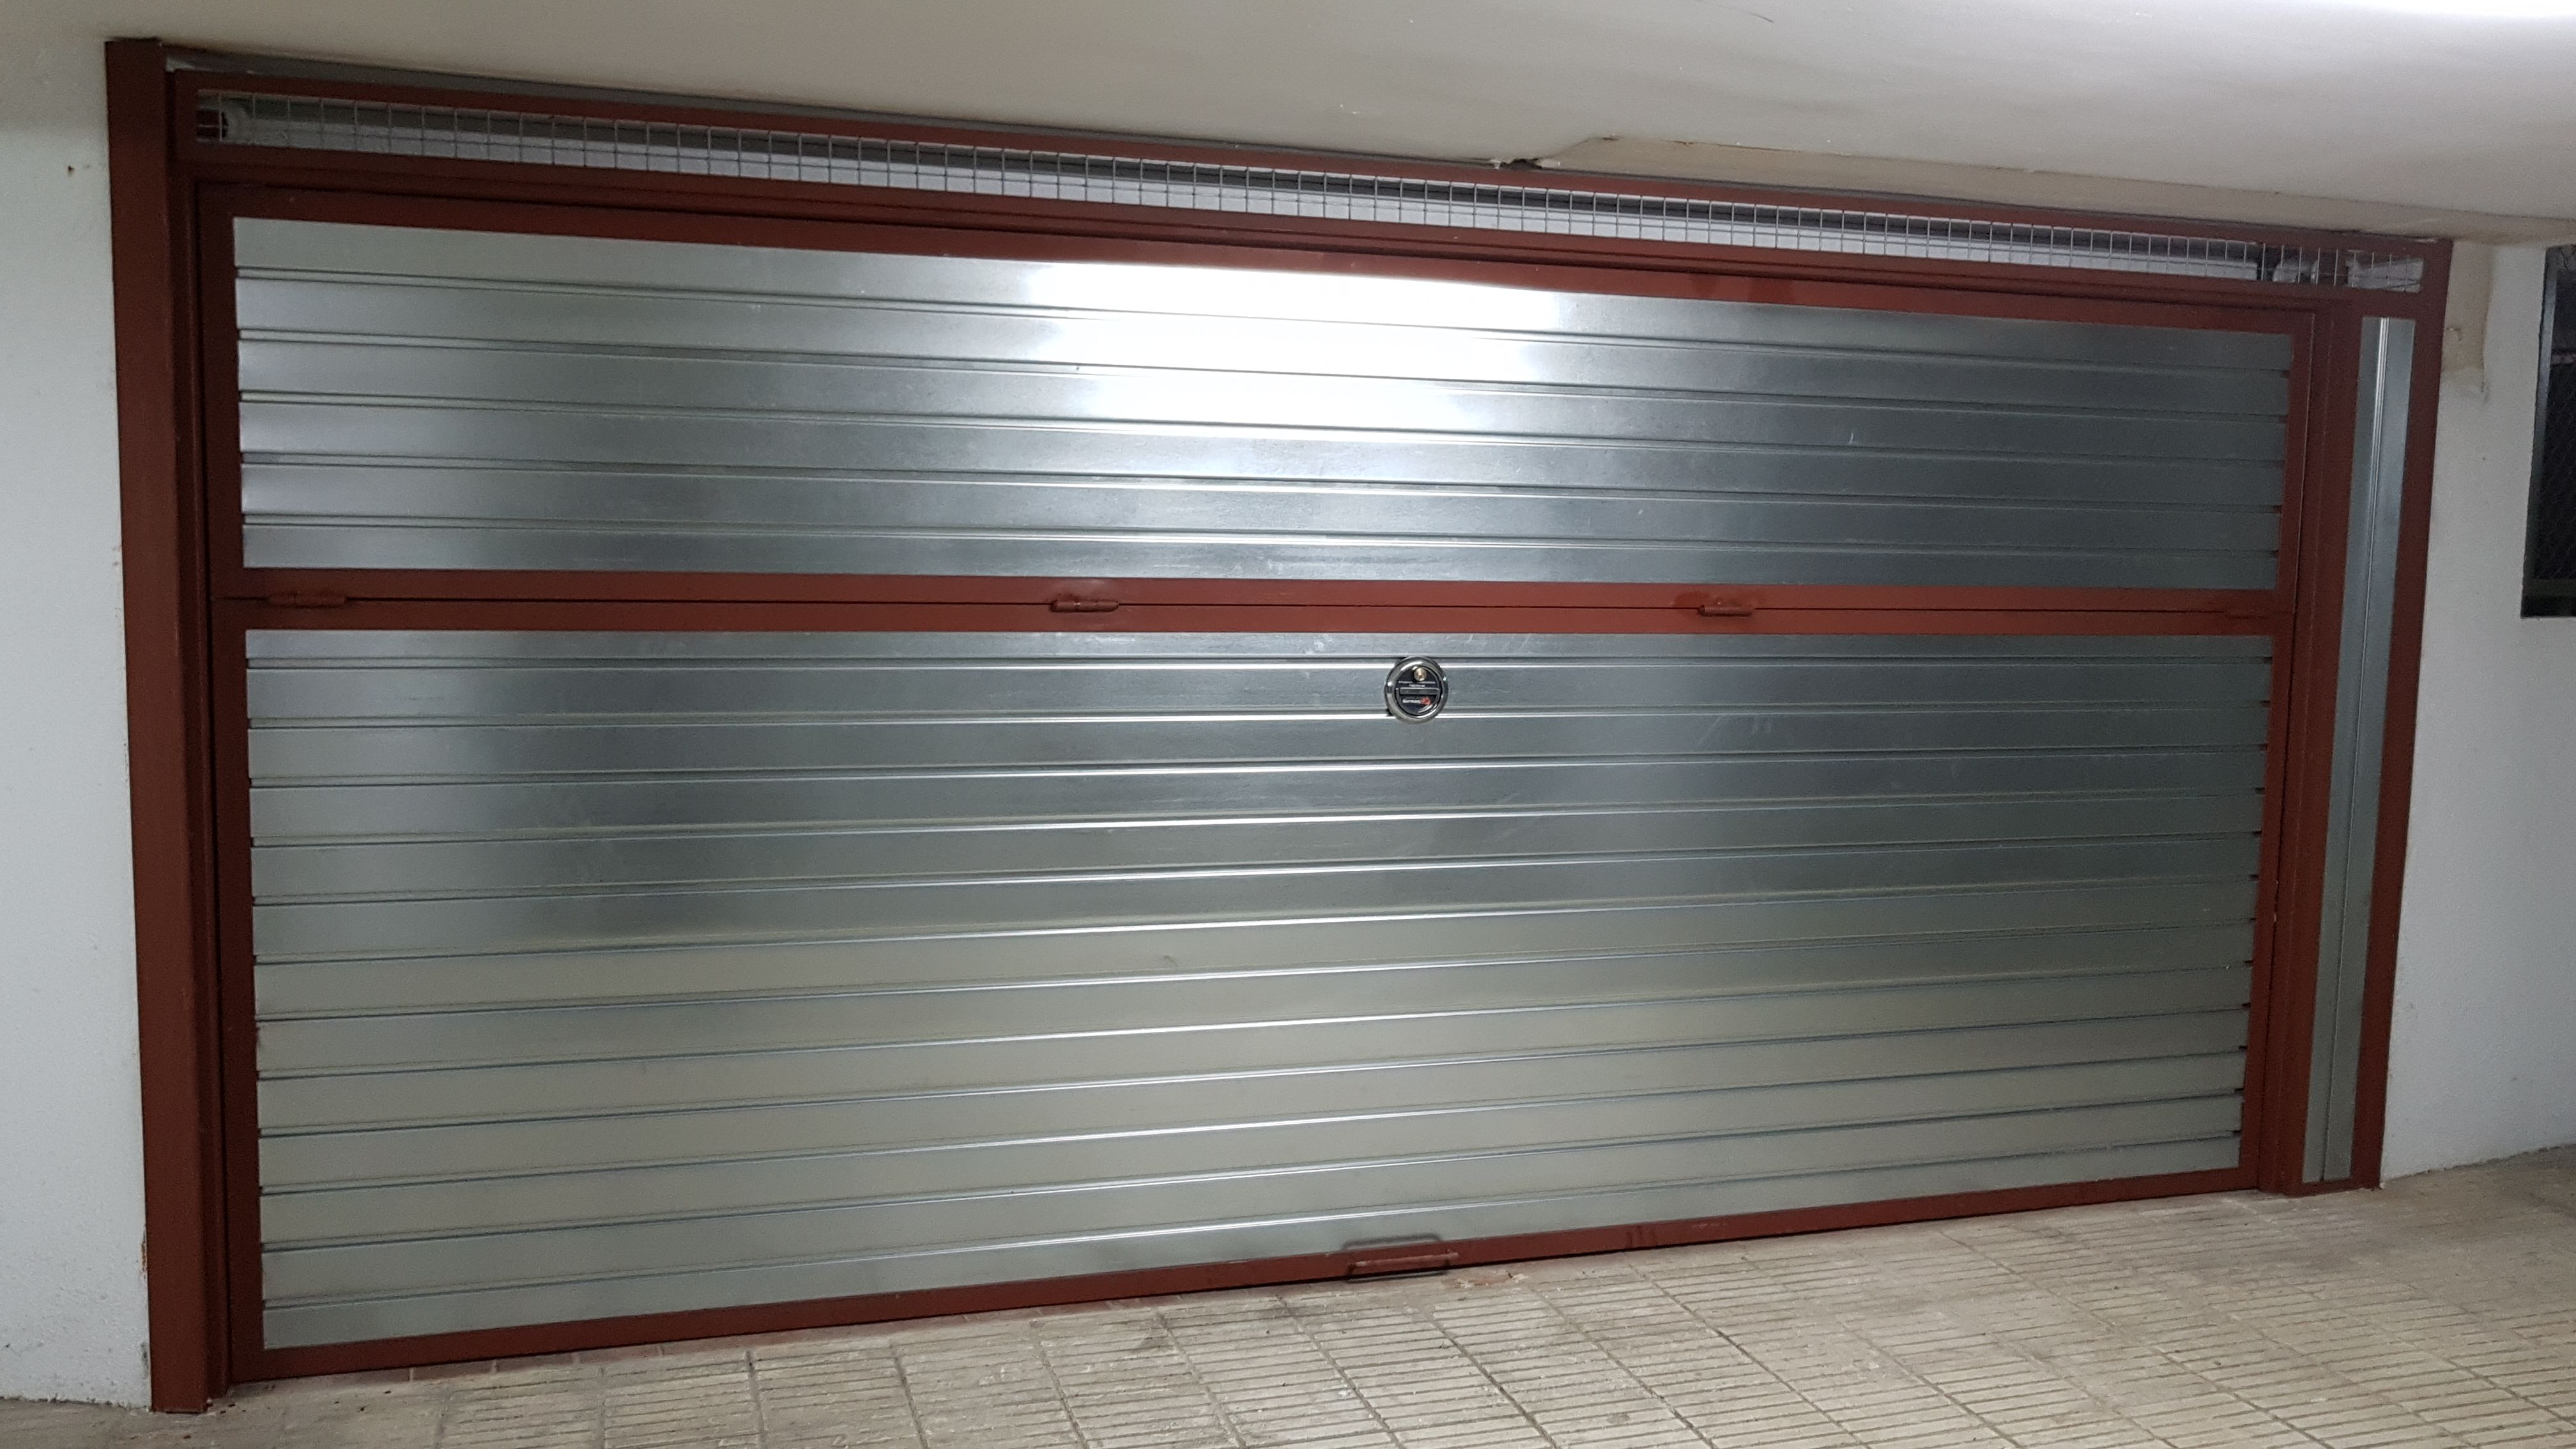 20 puerta basculante en chapa PC4